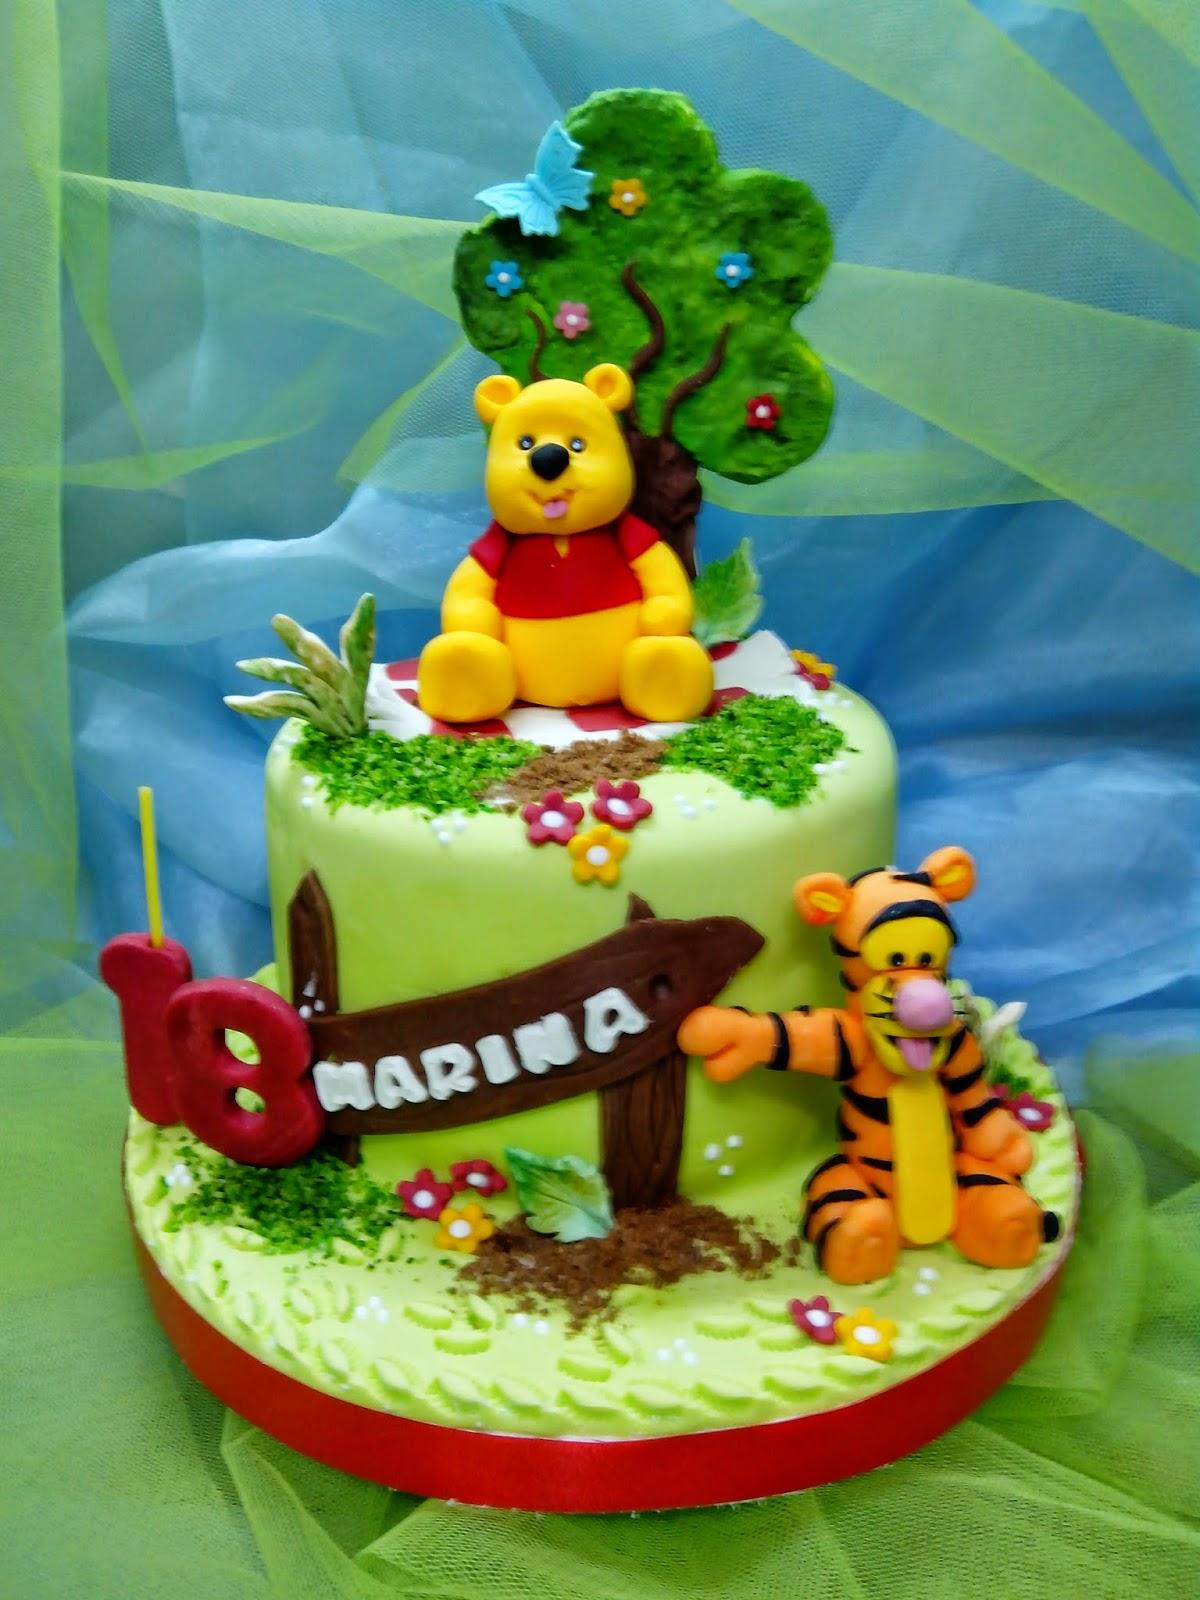 Decoracion de winnie pooh para fiestas 1 decoracion de for Decoracion winnie pooh para fiesta infantil